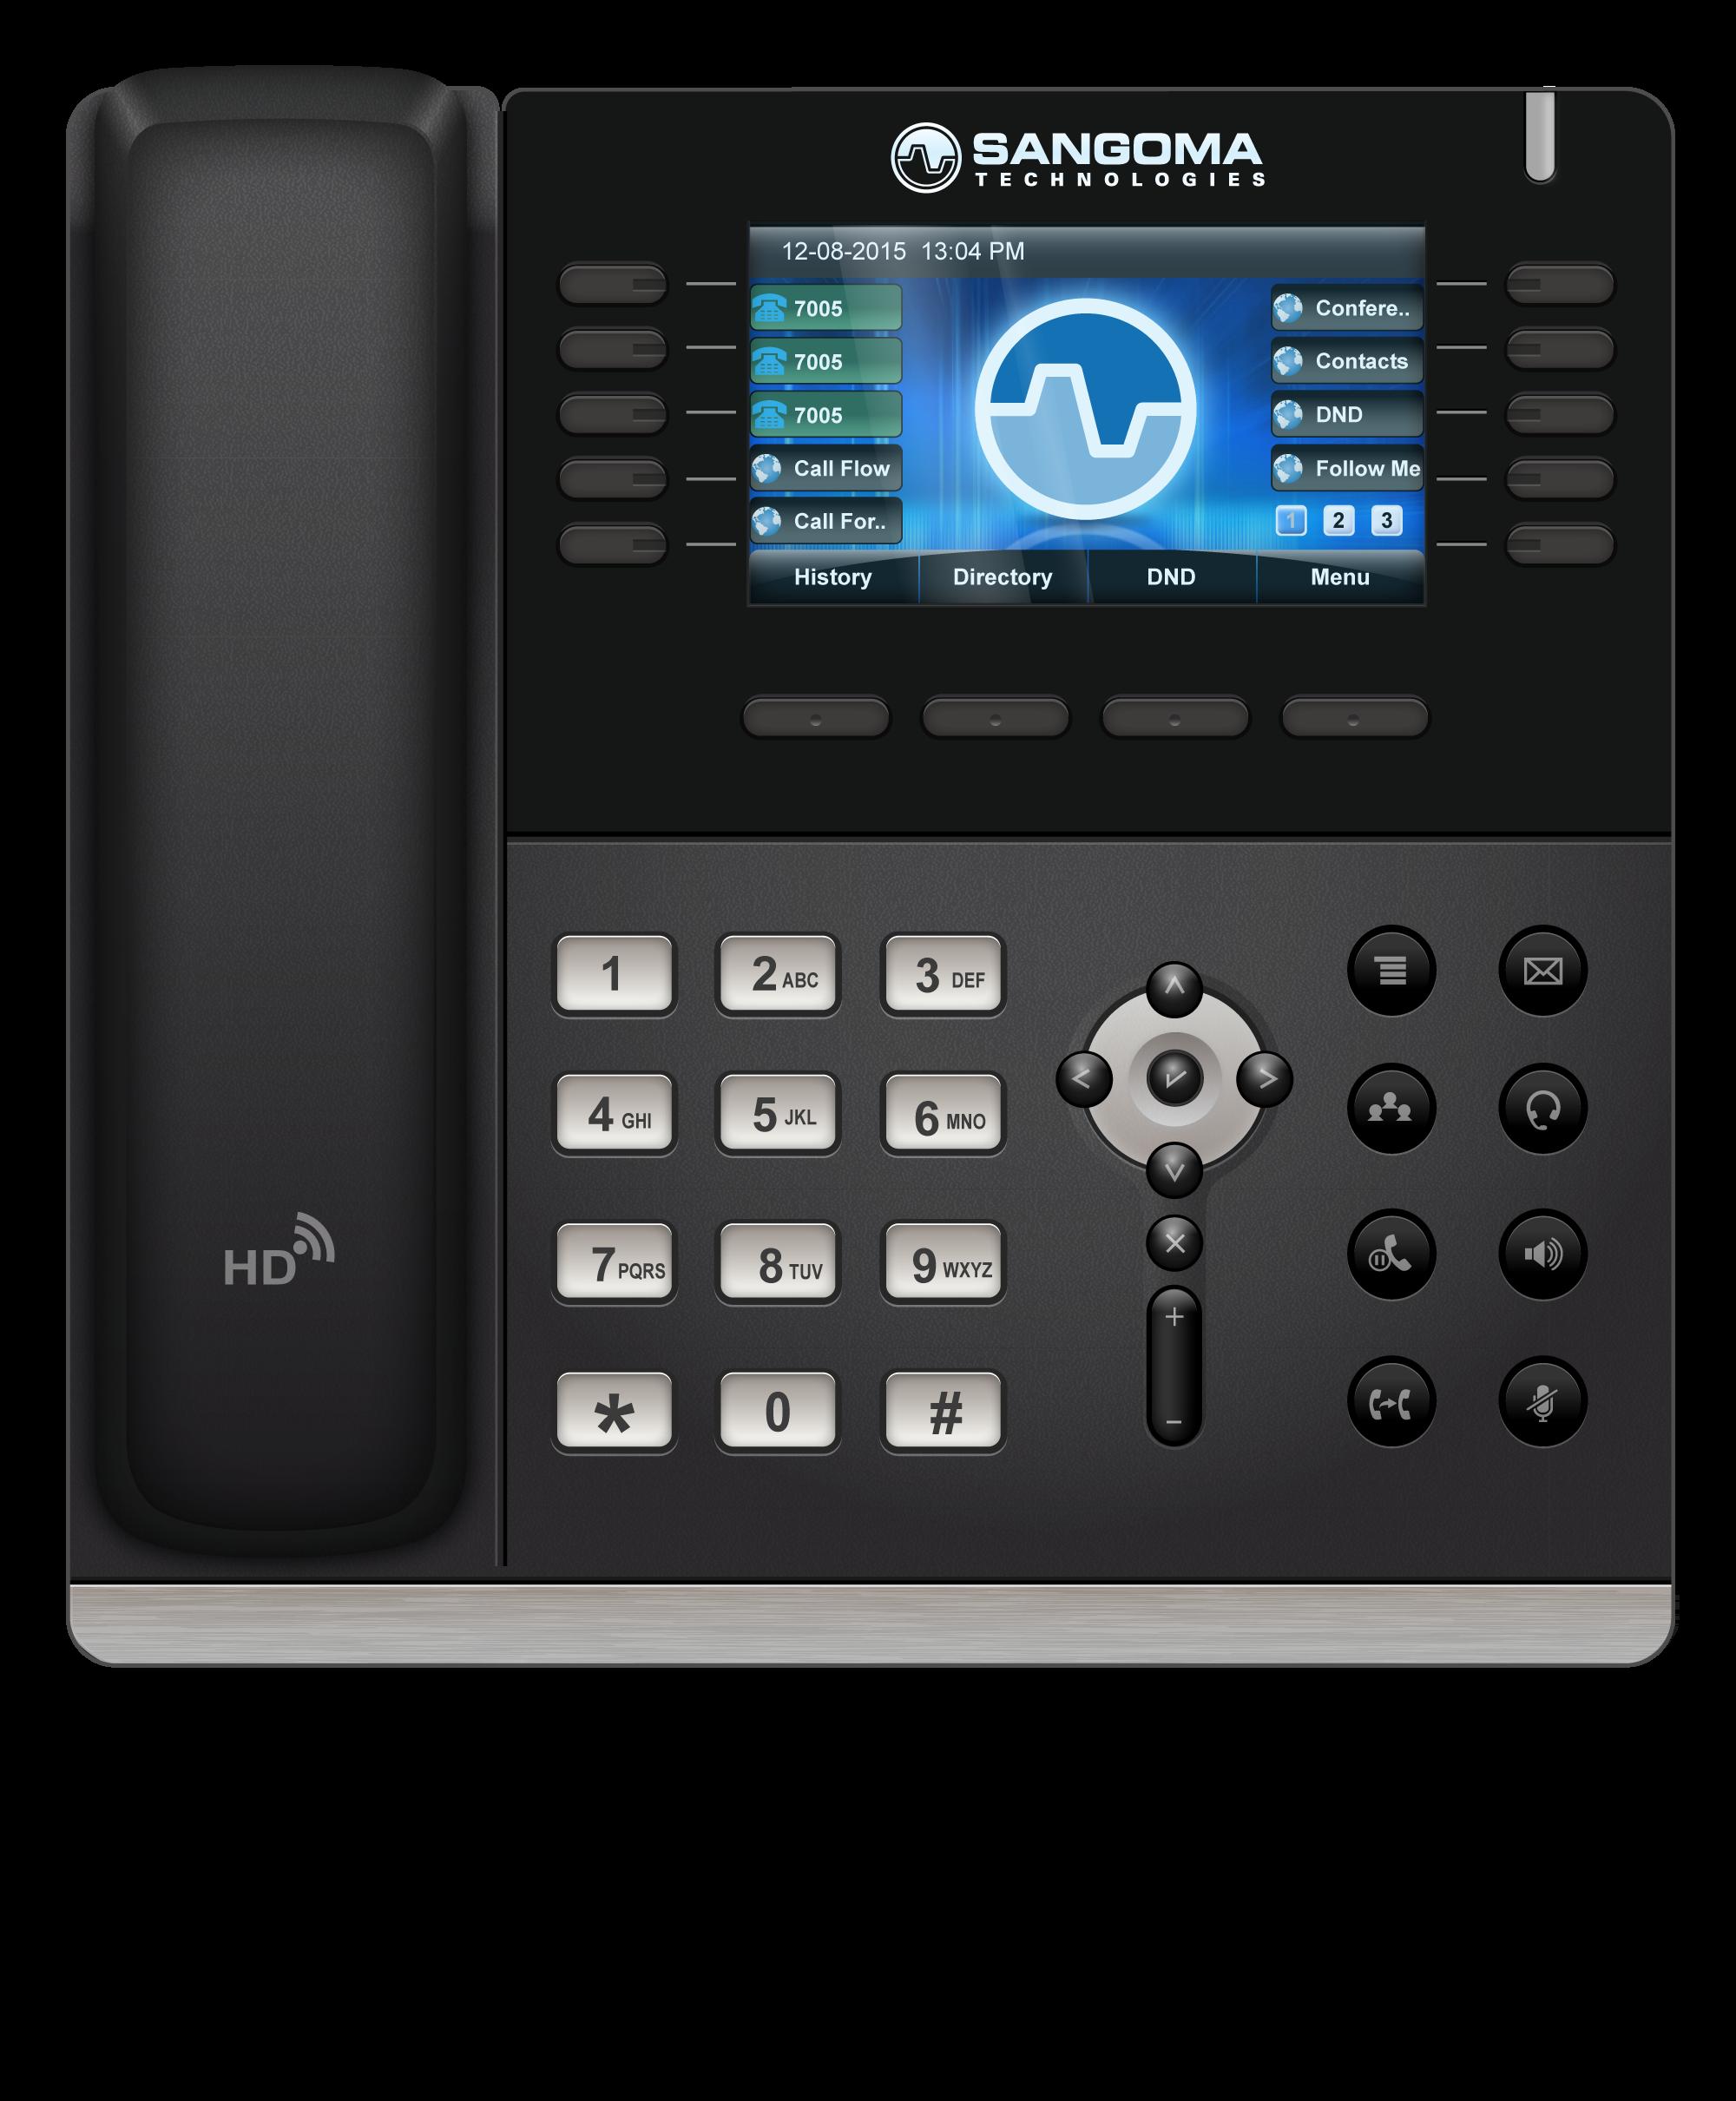 Vozell [ Sistemas Telefonicos ] PBX Cloud VoIP Conmutadores